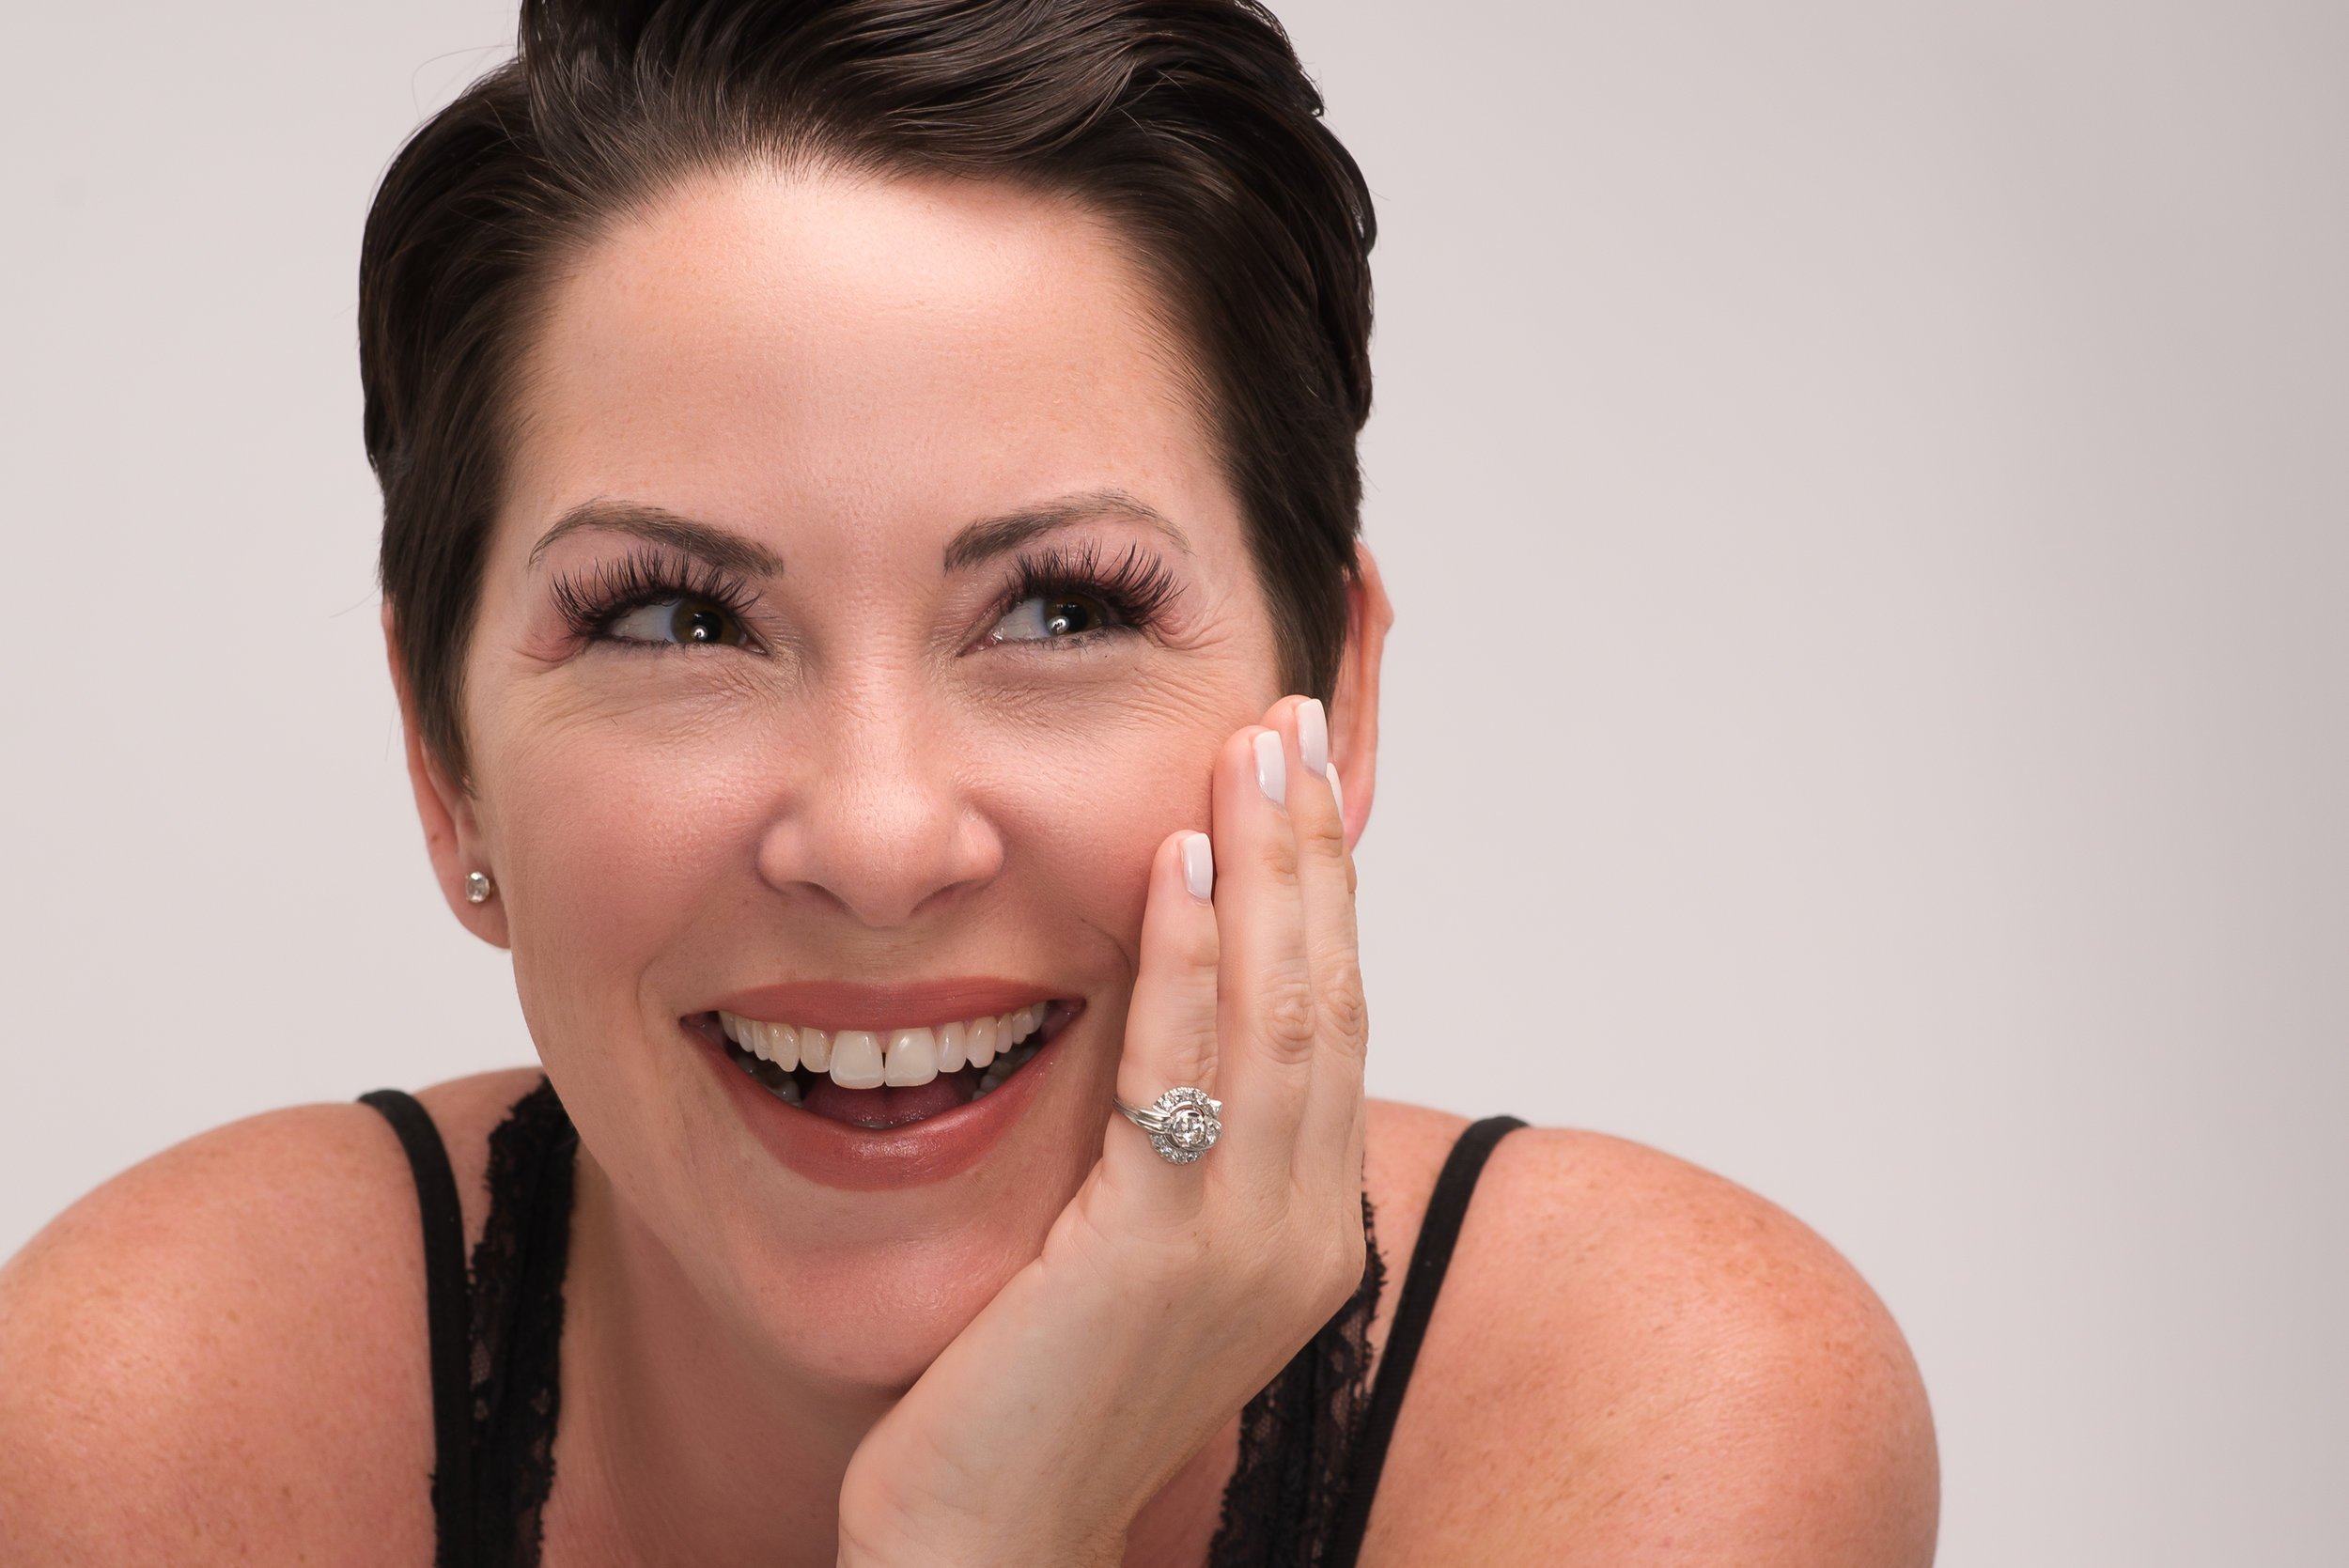 manager salon hair lashes nails social media content